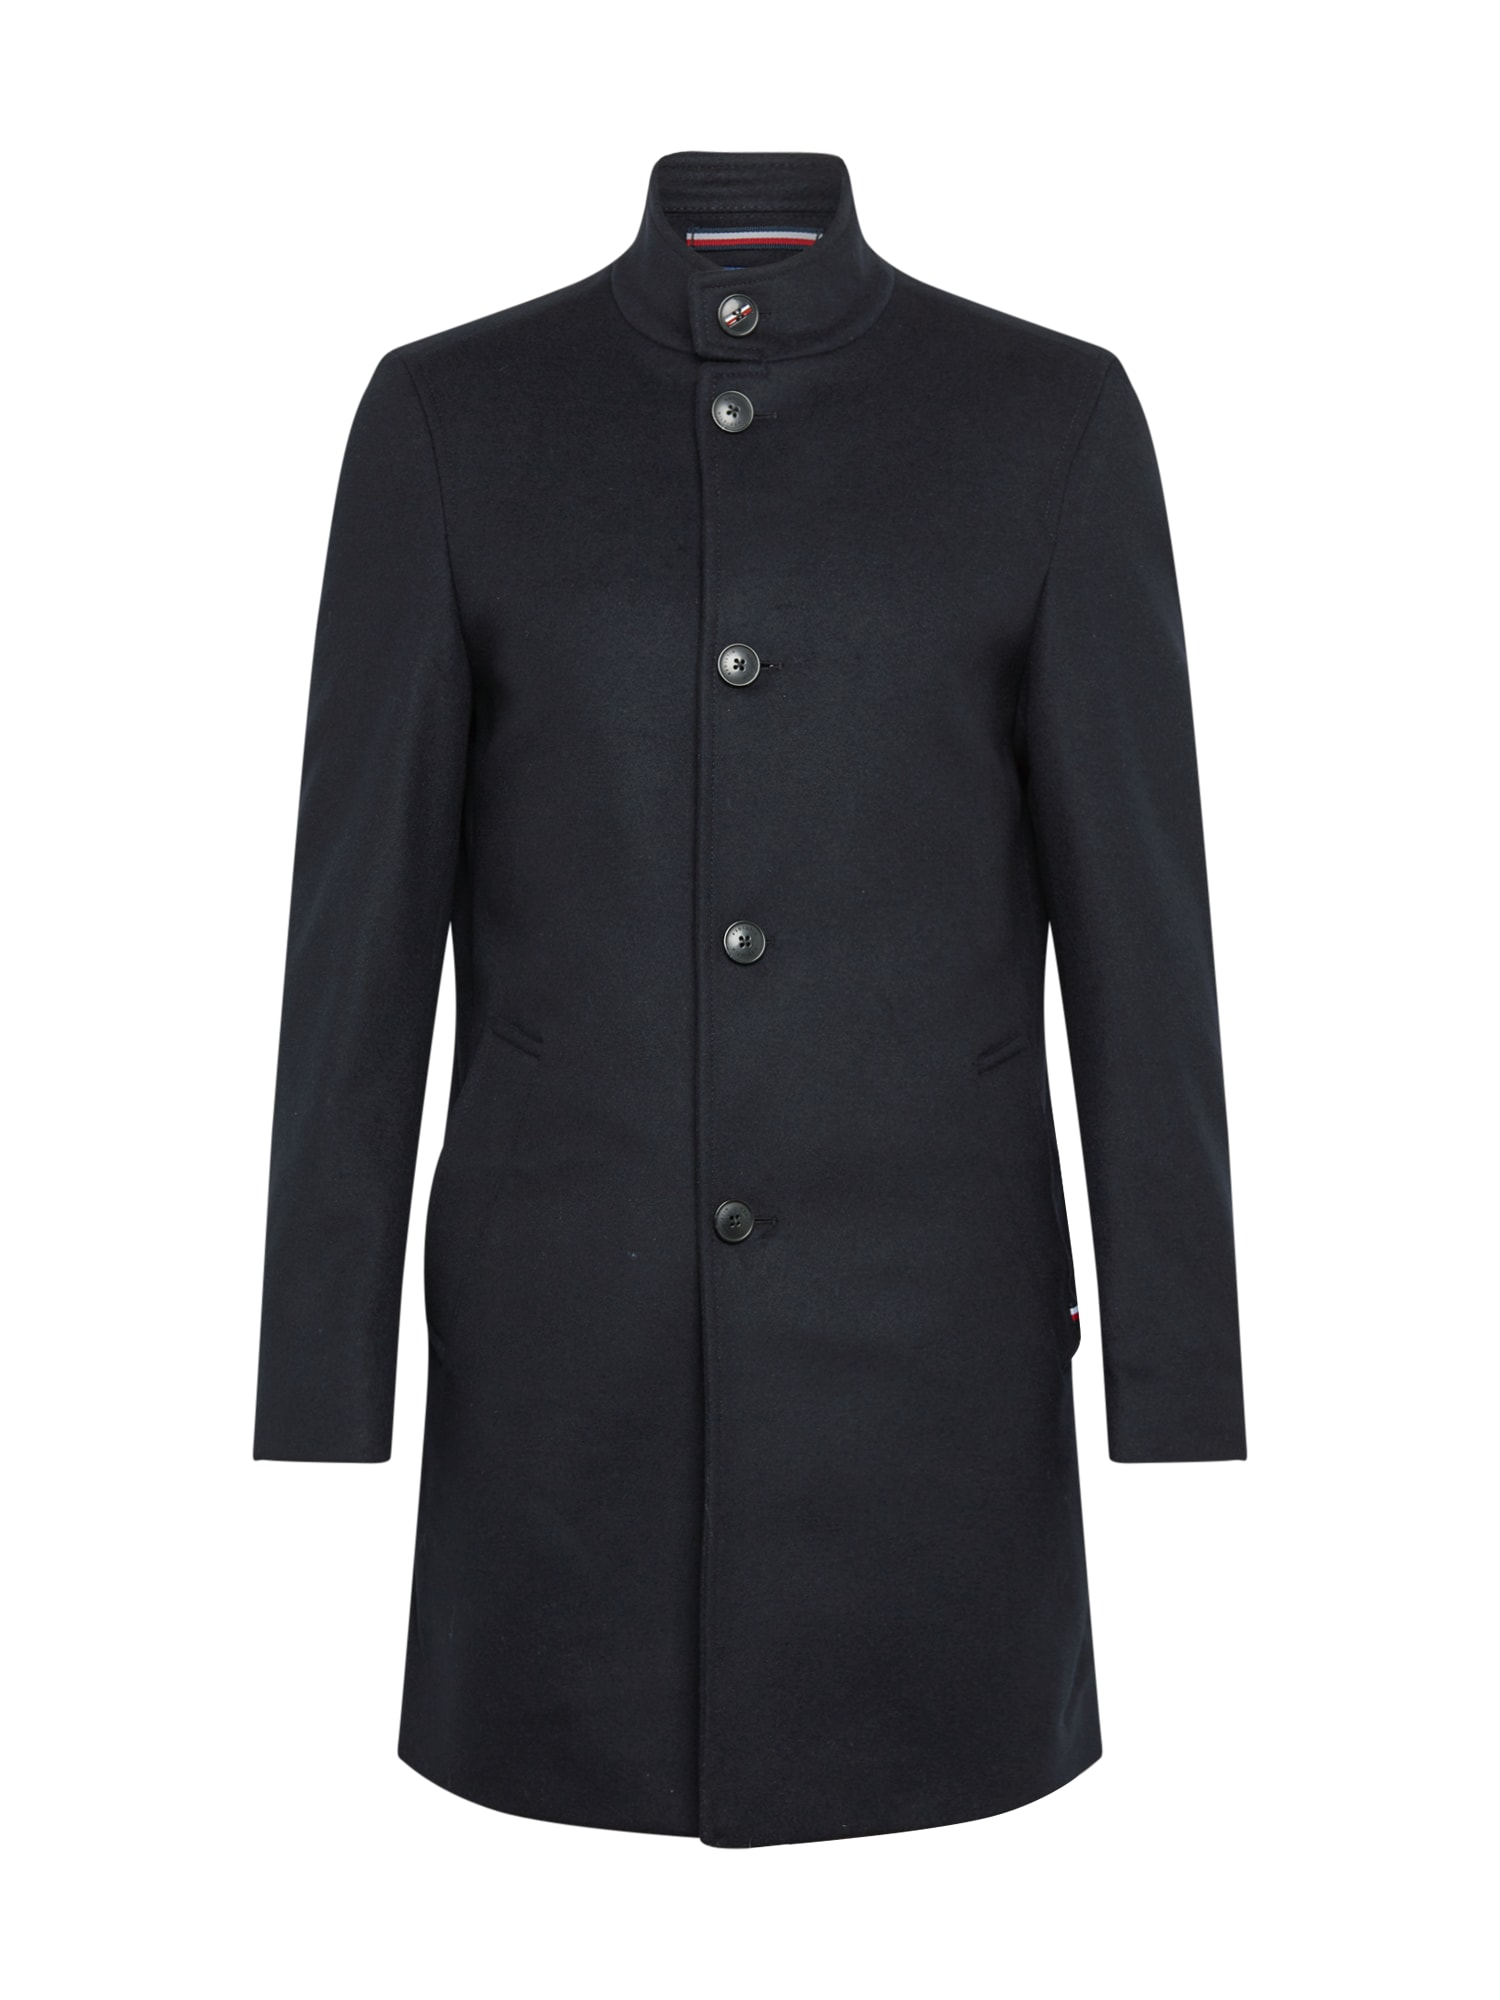 Tommy Hilfiger Tailored Demisezoninis paltas nakties mėlyna